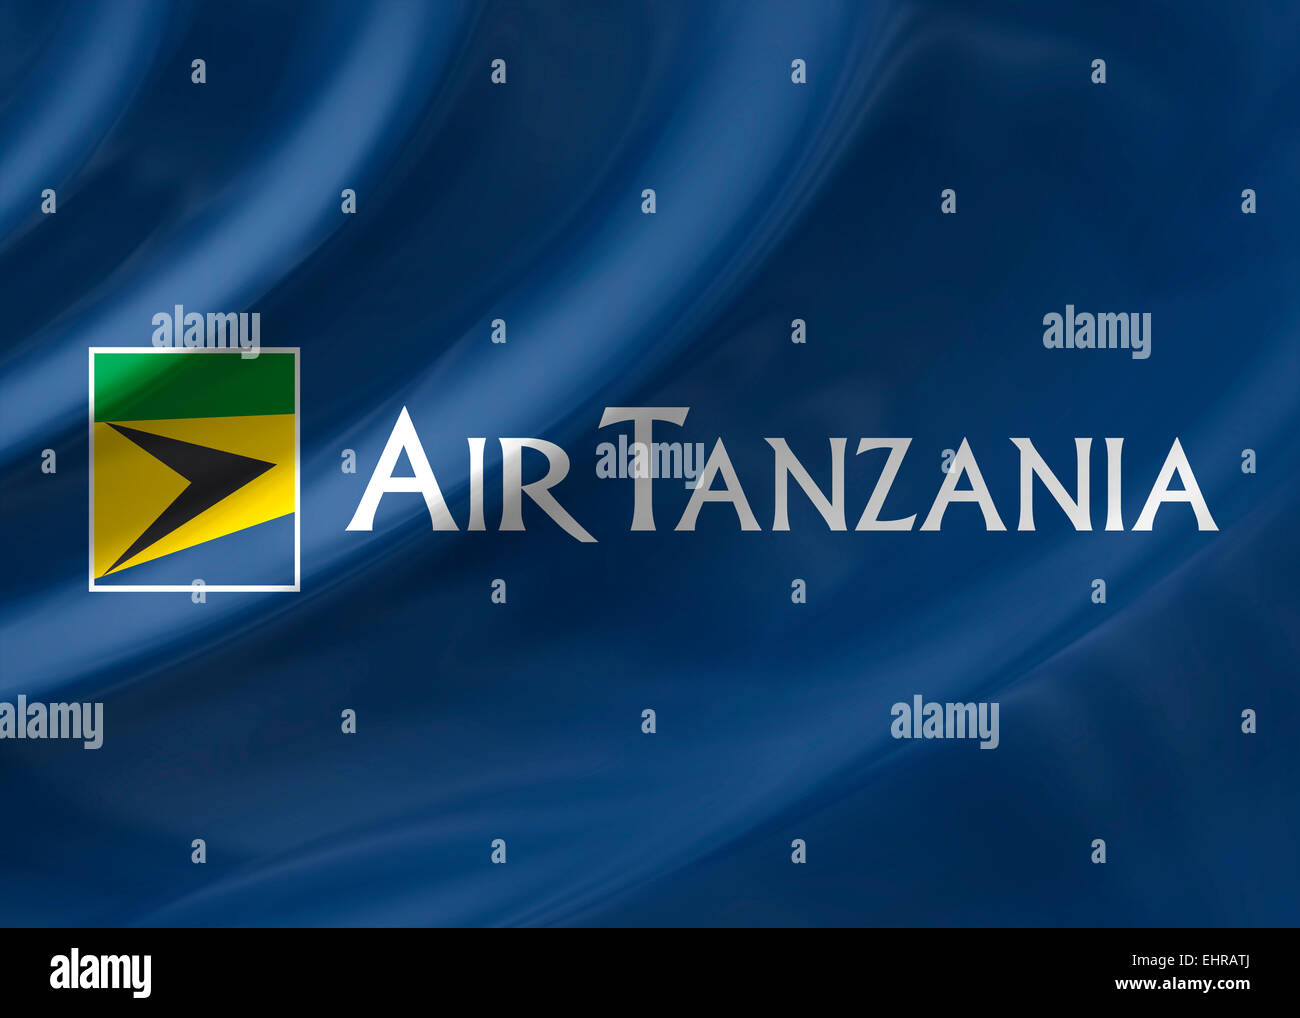 Air Tanzania logo icon flag emblem symbol - Stock Image